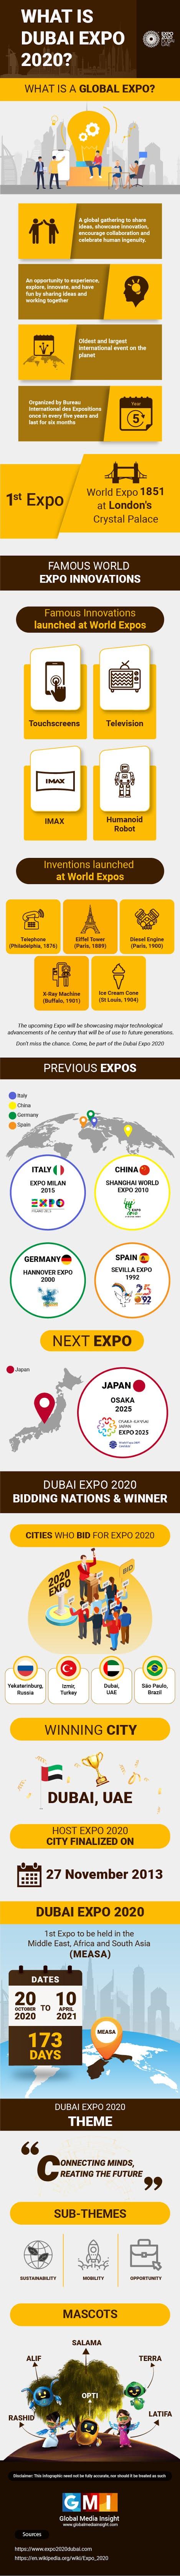 What Is Dubai Expo 2020? #infographic